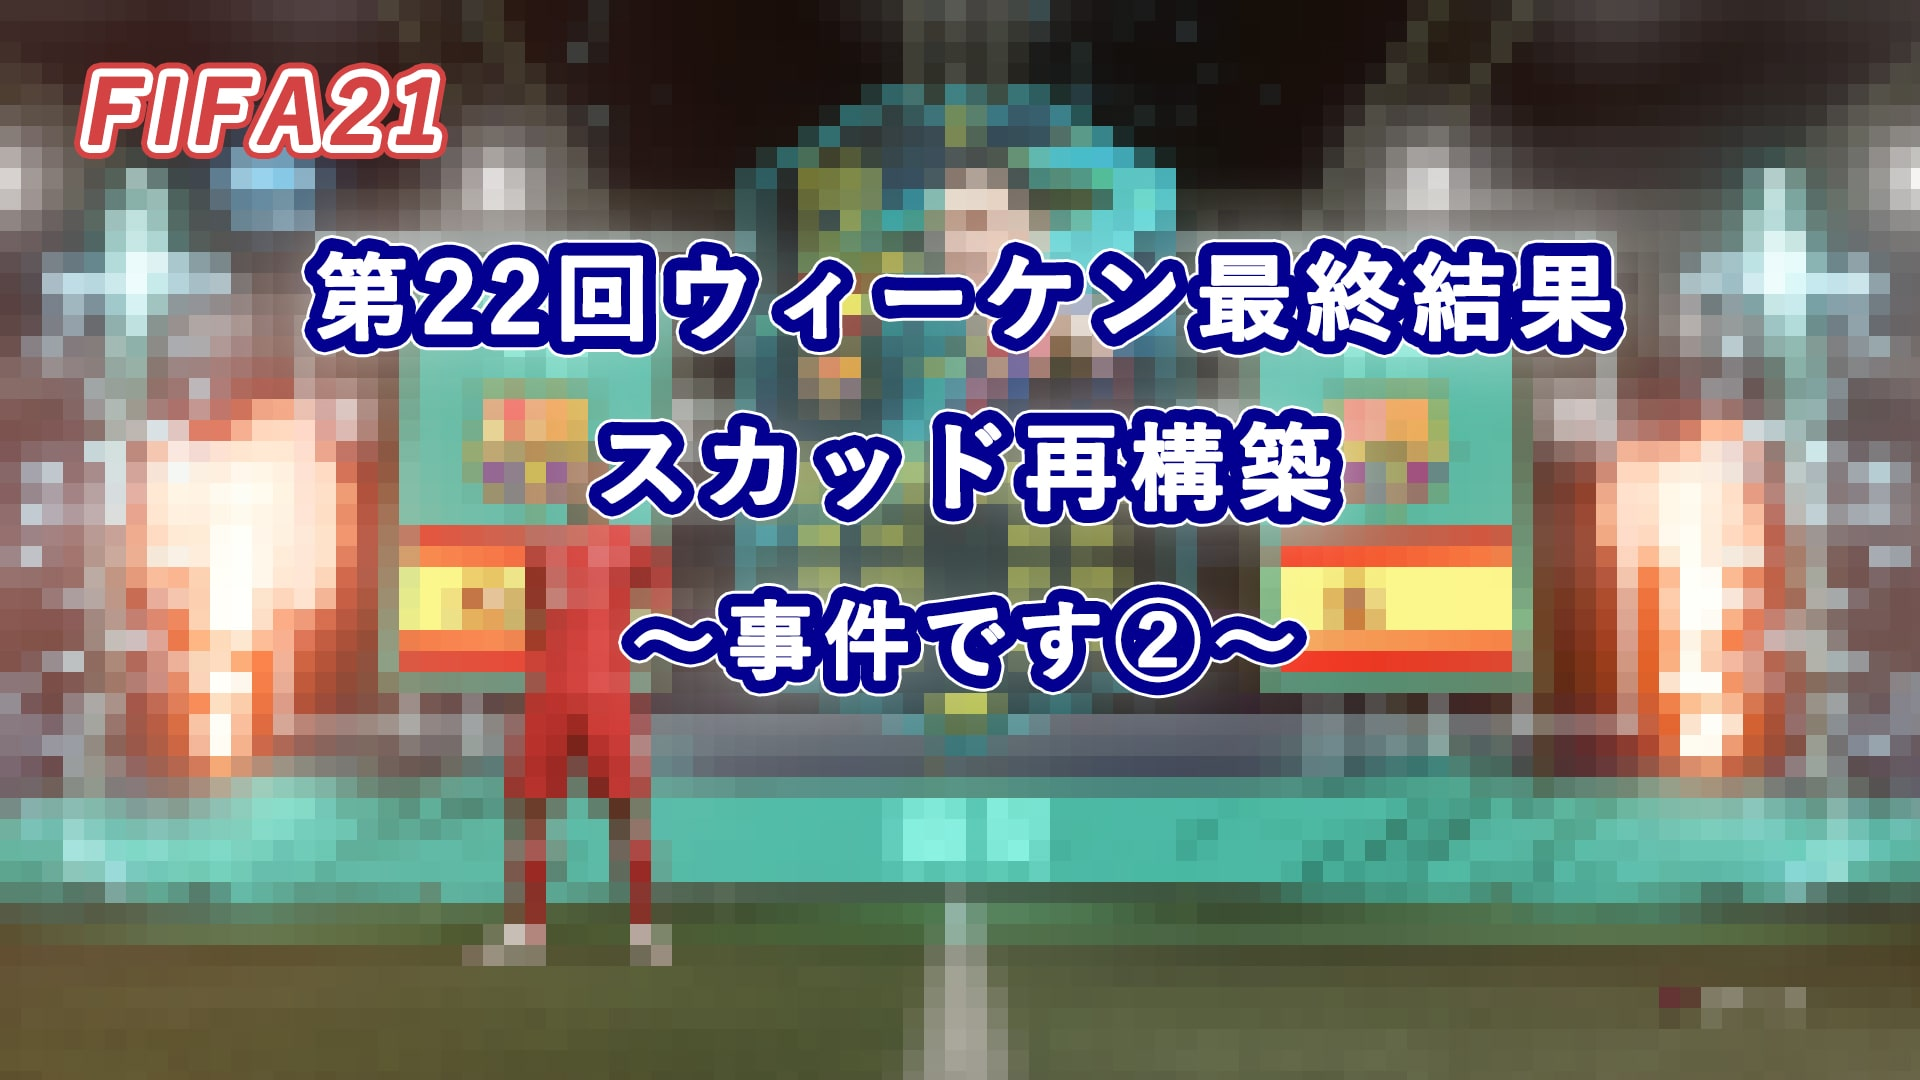 【FIFA21】第22回ウィーケン最終結果・スカッド再構築 ~事件です②~